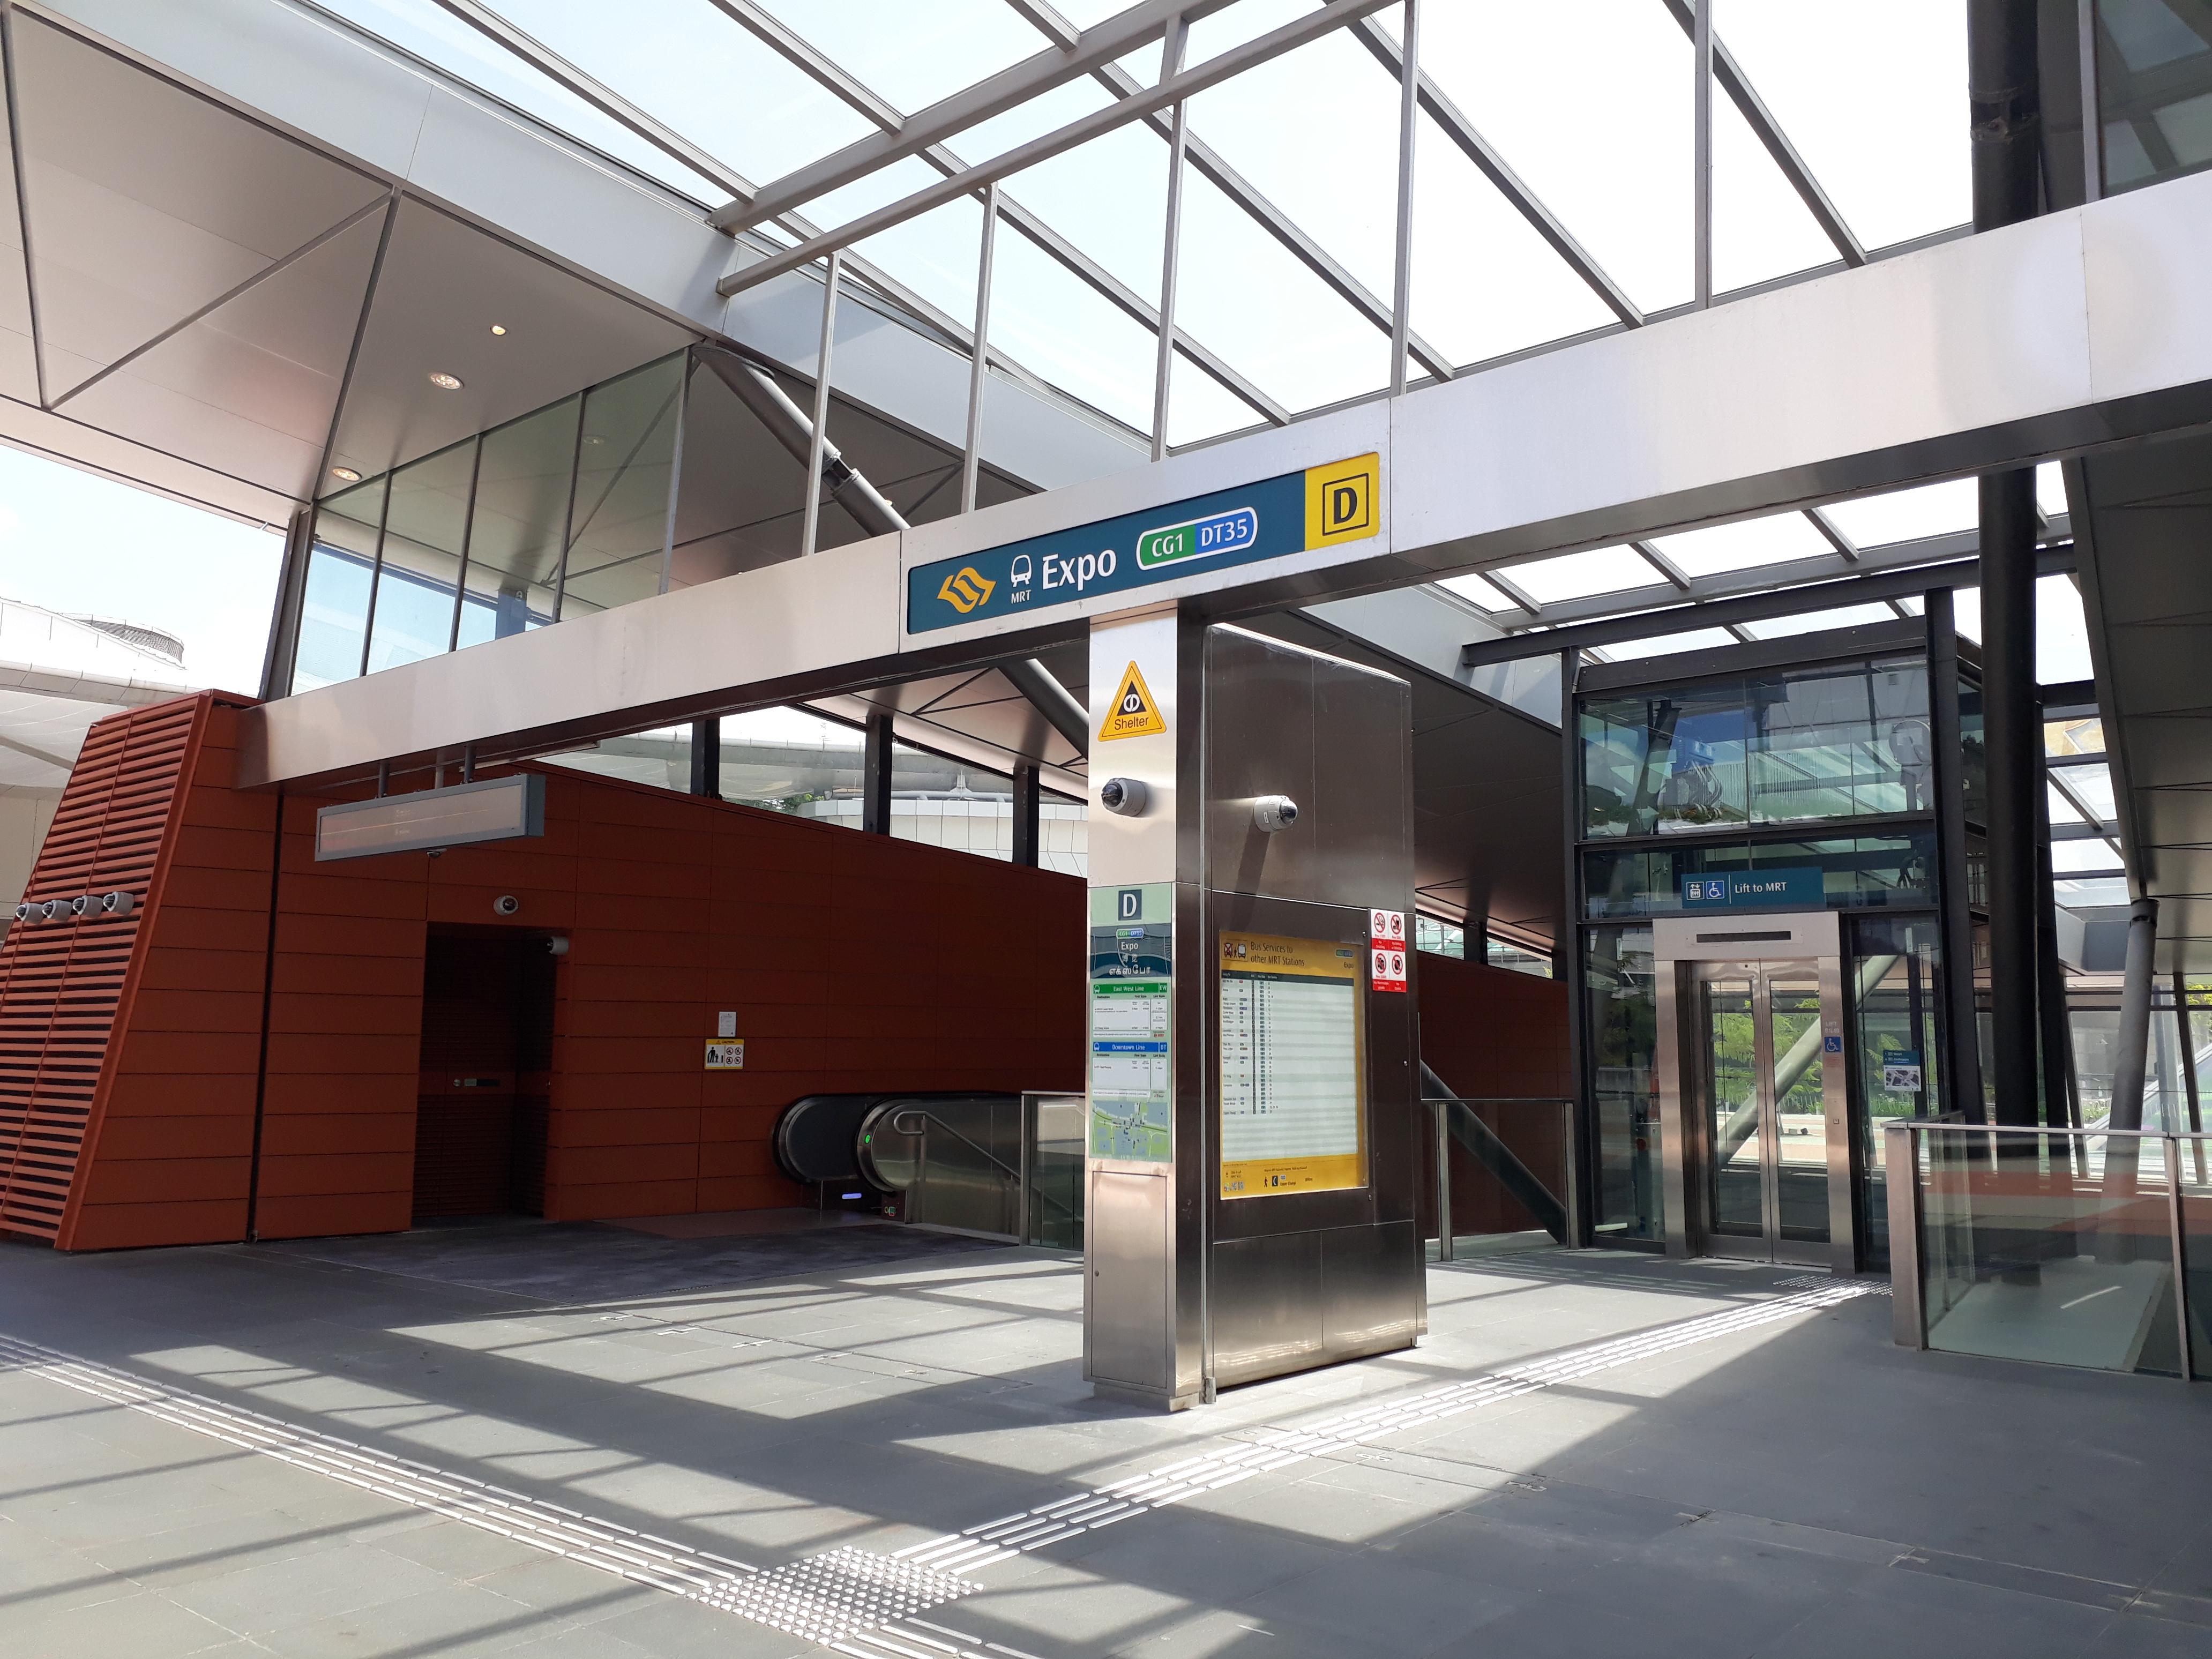 Expo Mrt Station Wikipedia